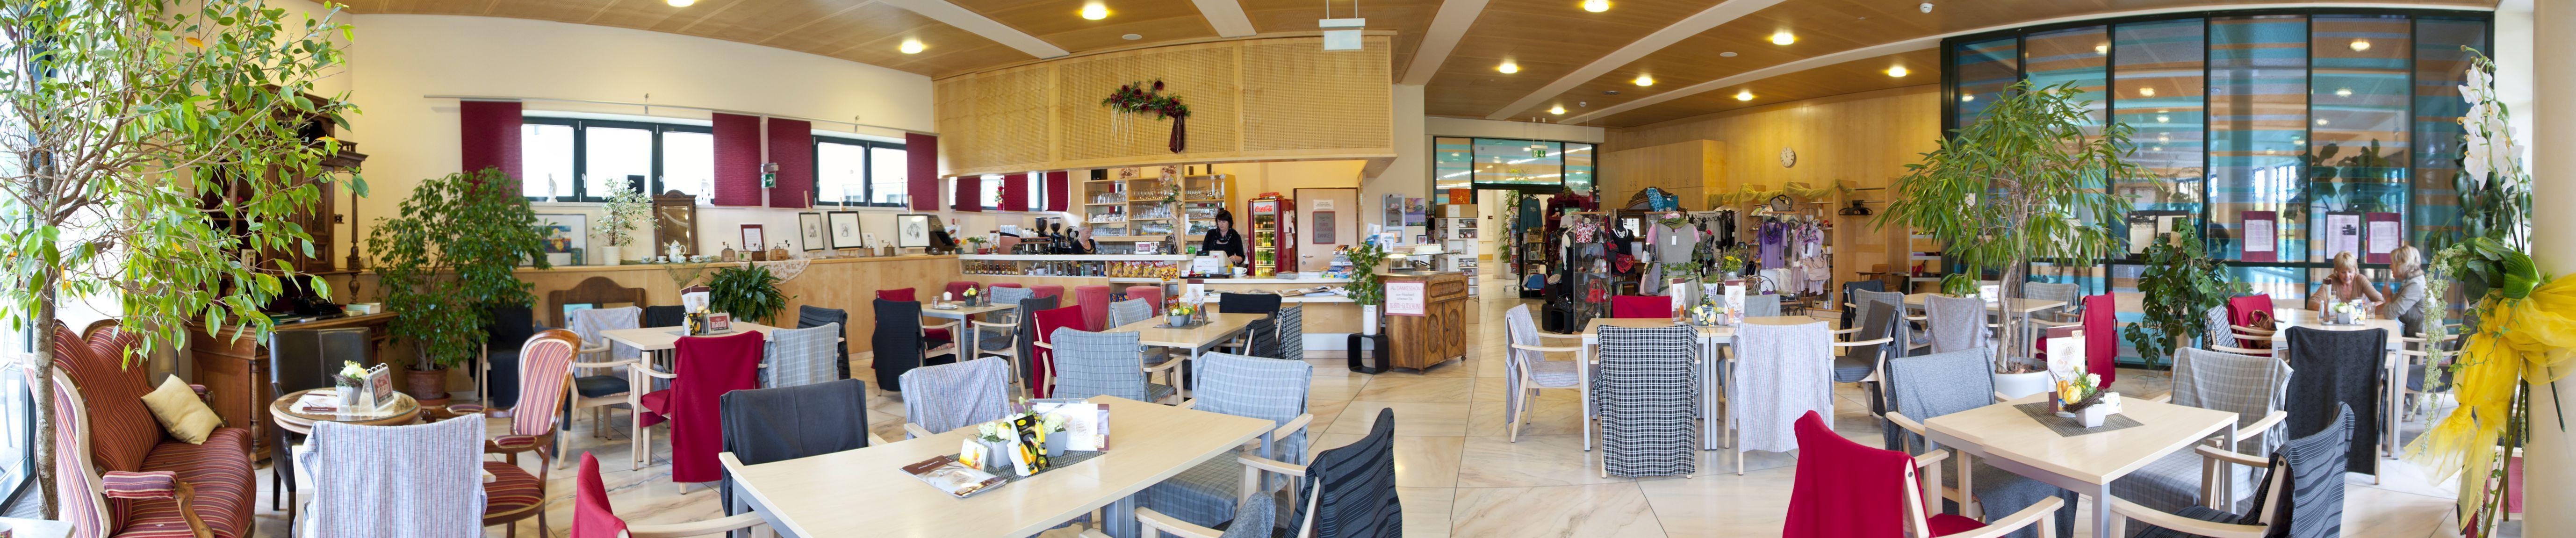 Marmi kurkaffee imbiss shop in gr bming for Geschenkartikel shop